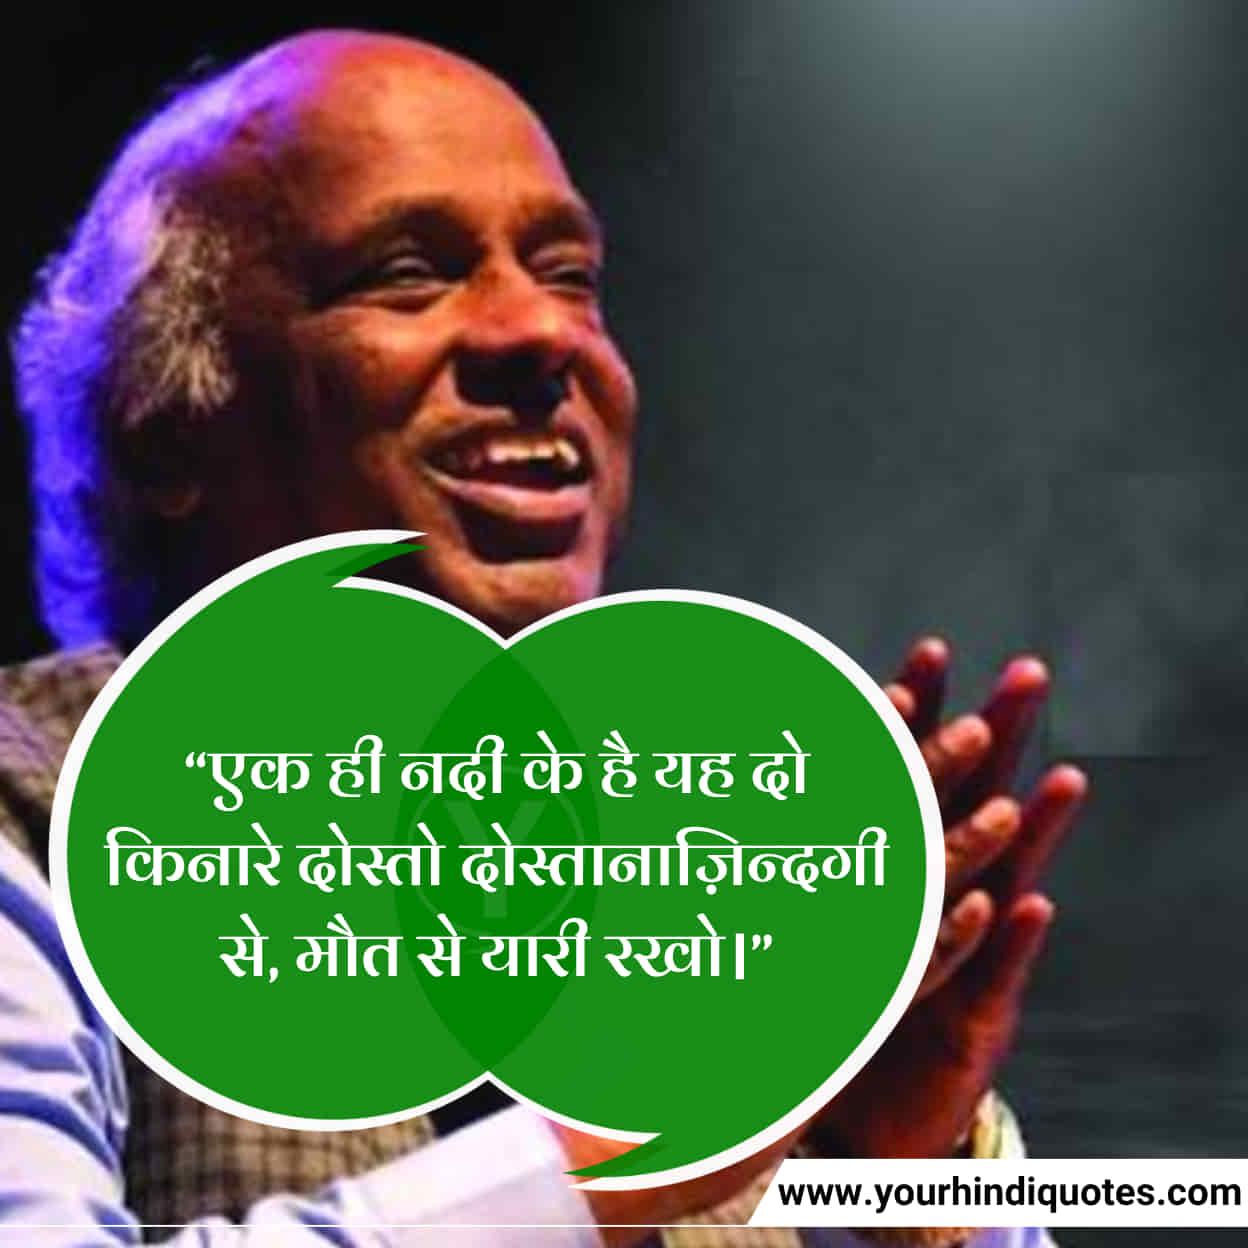 Best 2 Line Rahat Indori Shayari